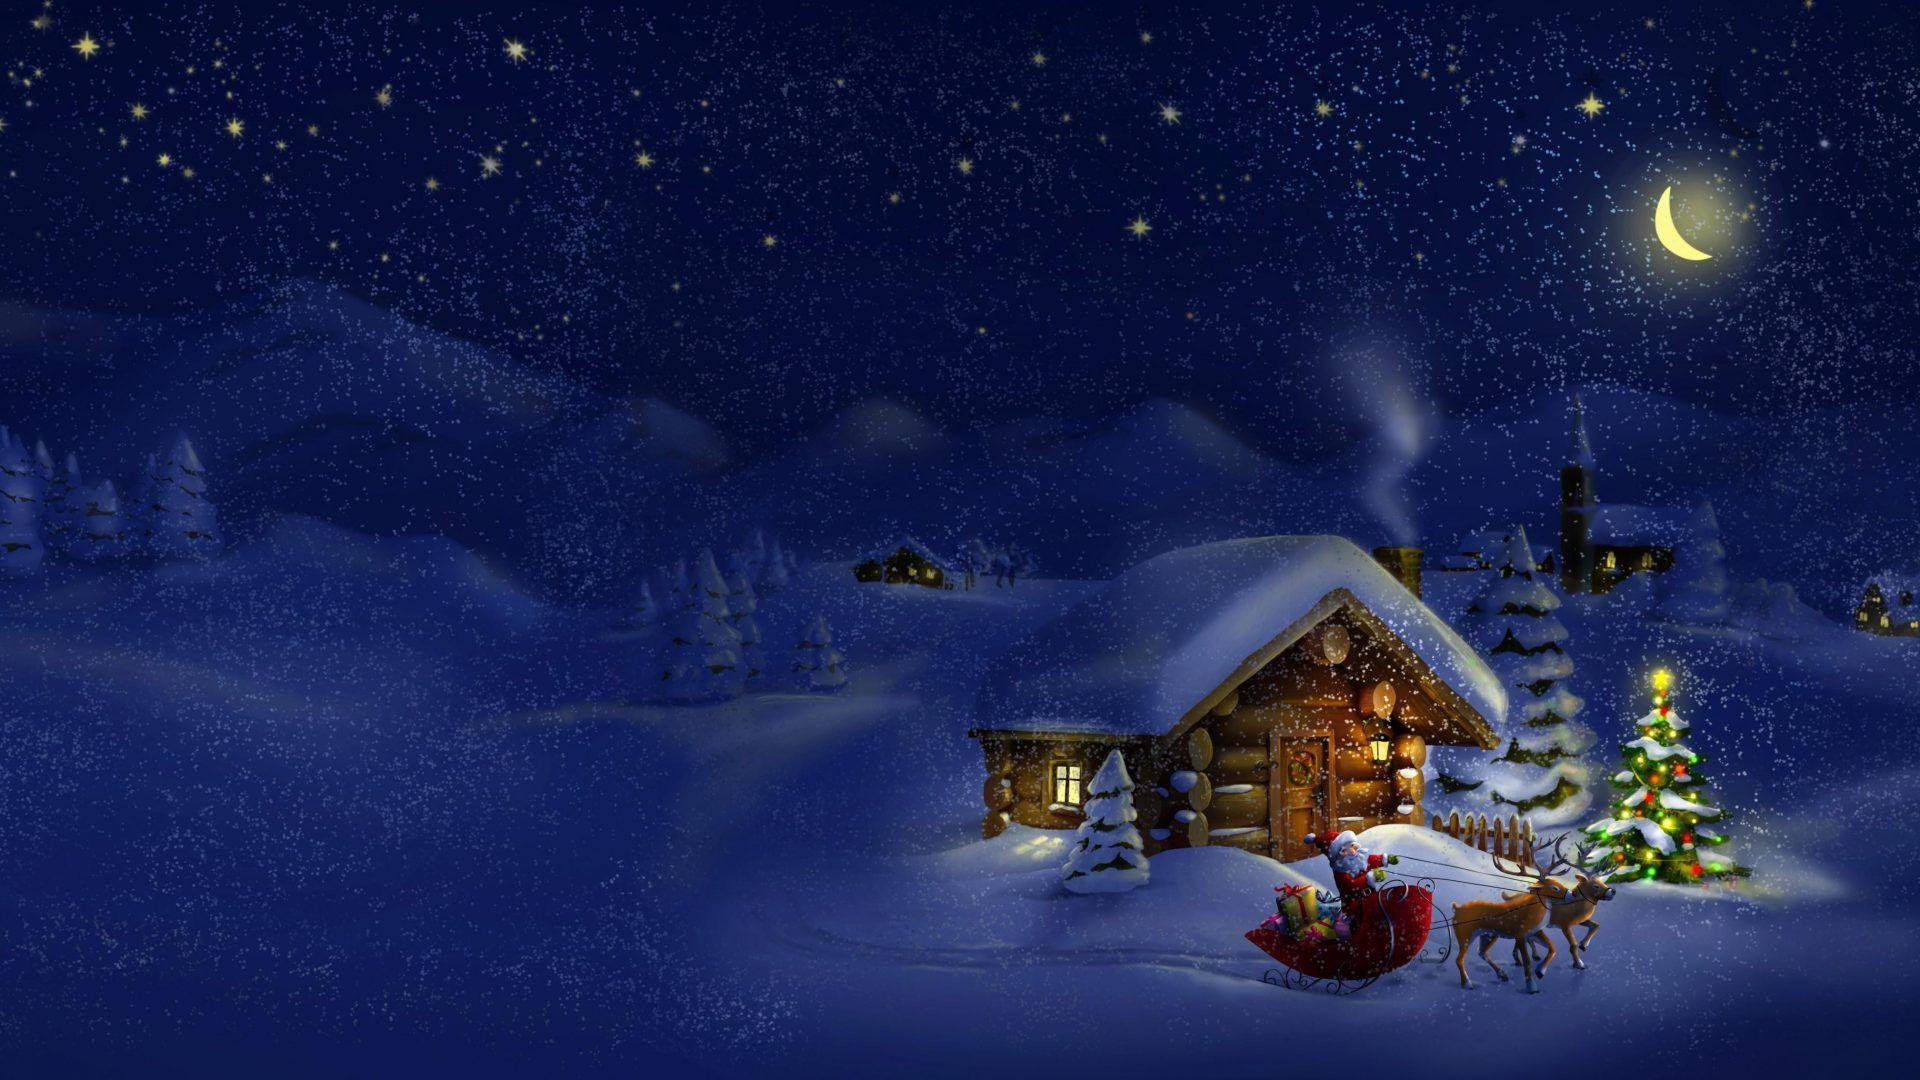 Xinature Com Eve Winter Snow Merry Magic Evening Santa Nature Xmas Snowy Christmas Time Free D Christmas Backdrops Christmas Wallpaper Hd Christmas Wallpaper